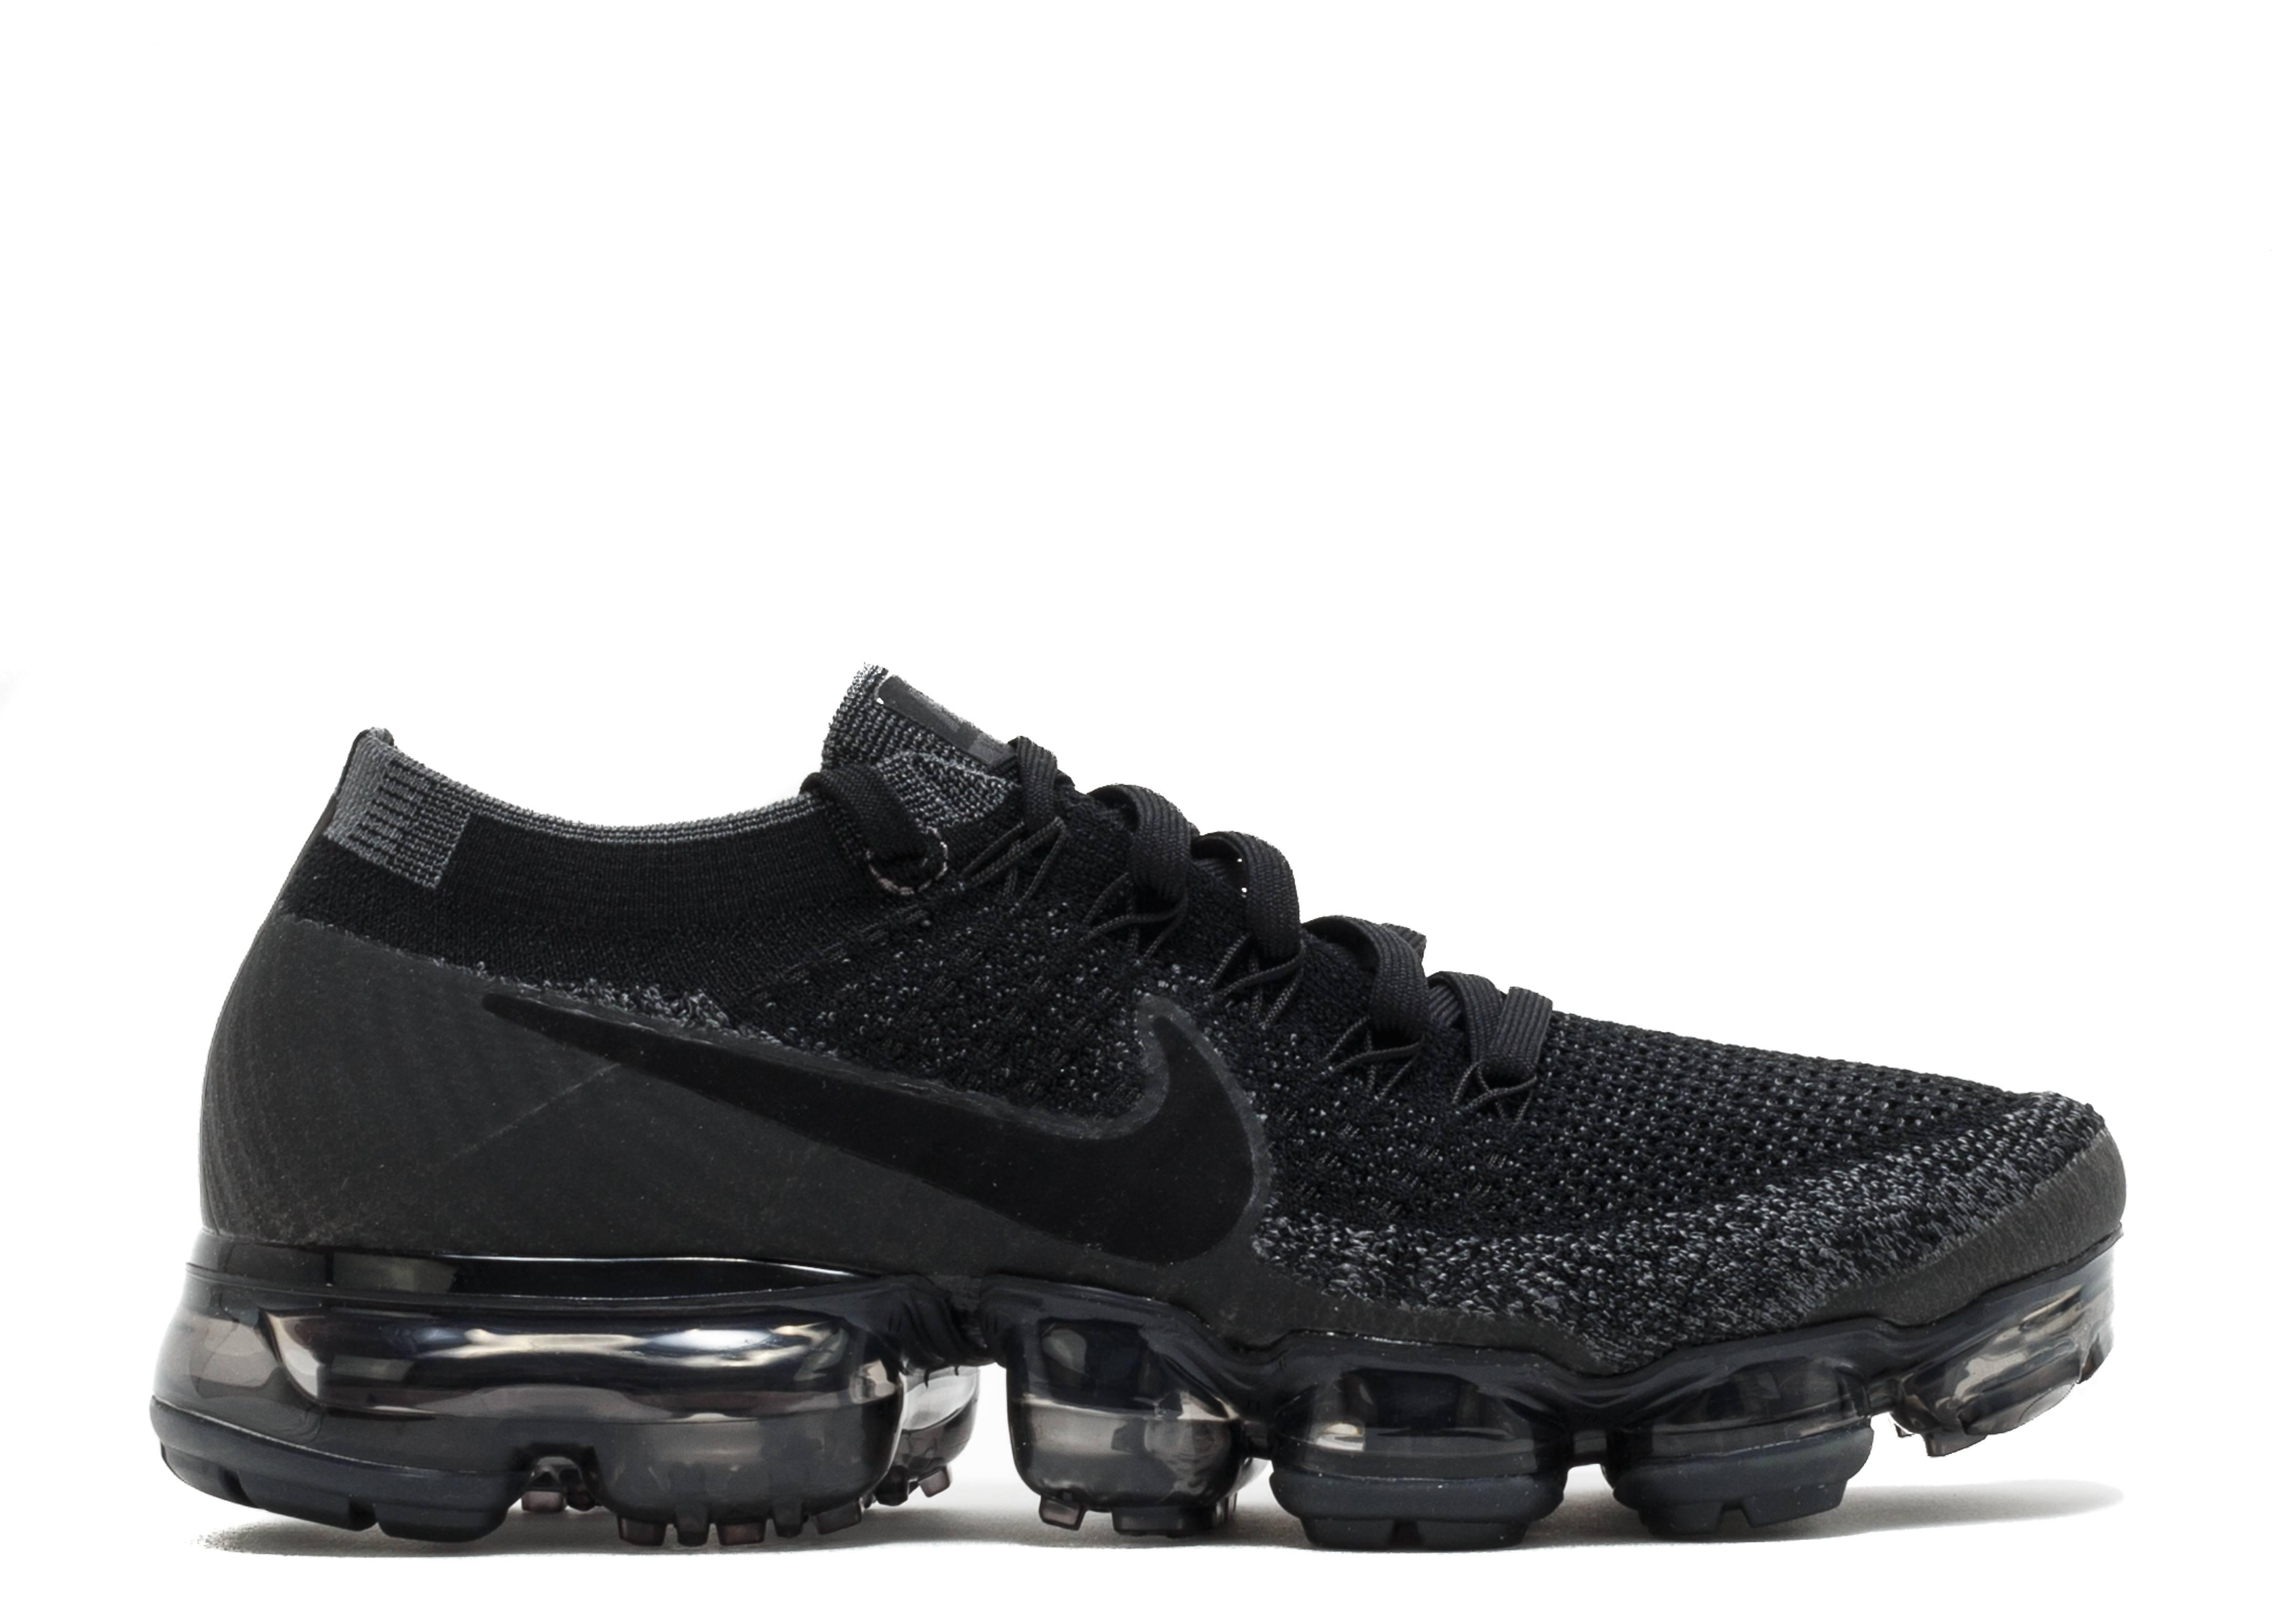 Nike Vapormax Flyknit Black Grey